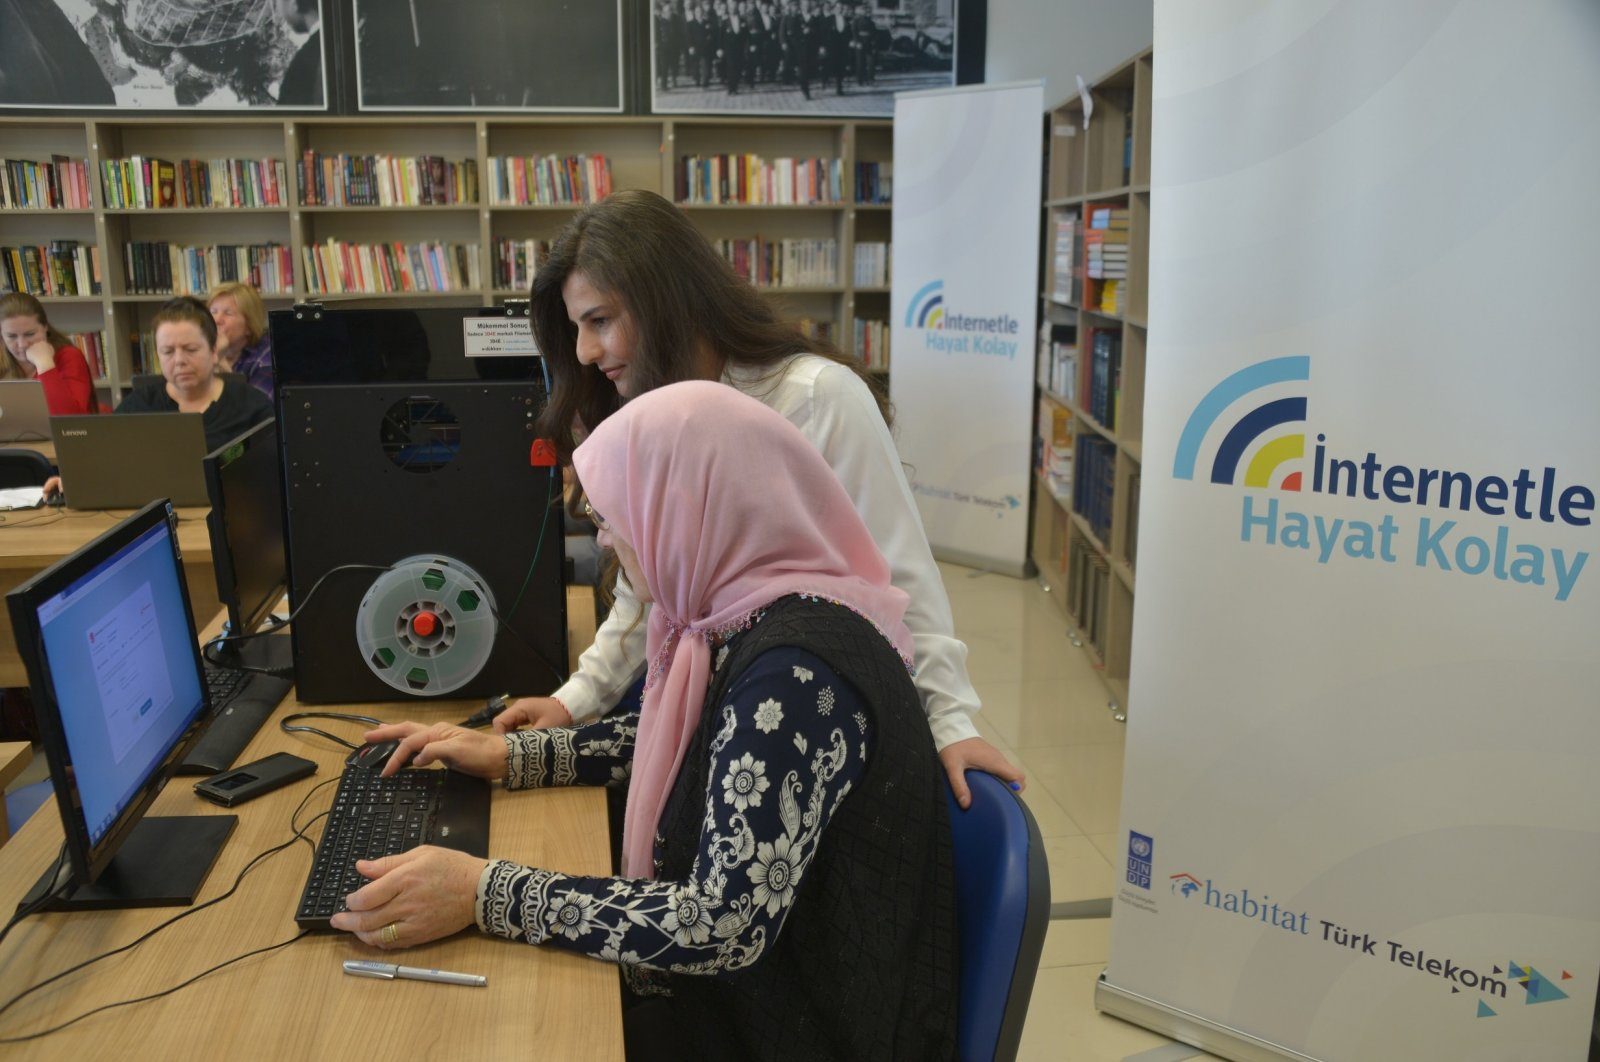 A woman attends a computer class in Kırklareli, northwestern Turkey on March 17, 2019. (Photo by Özgür Tiran)